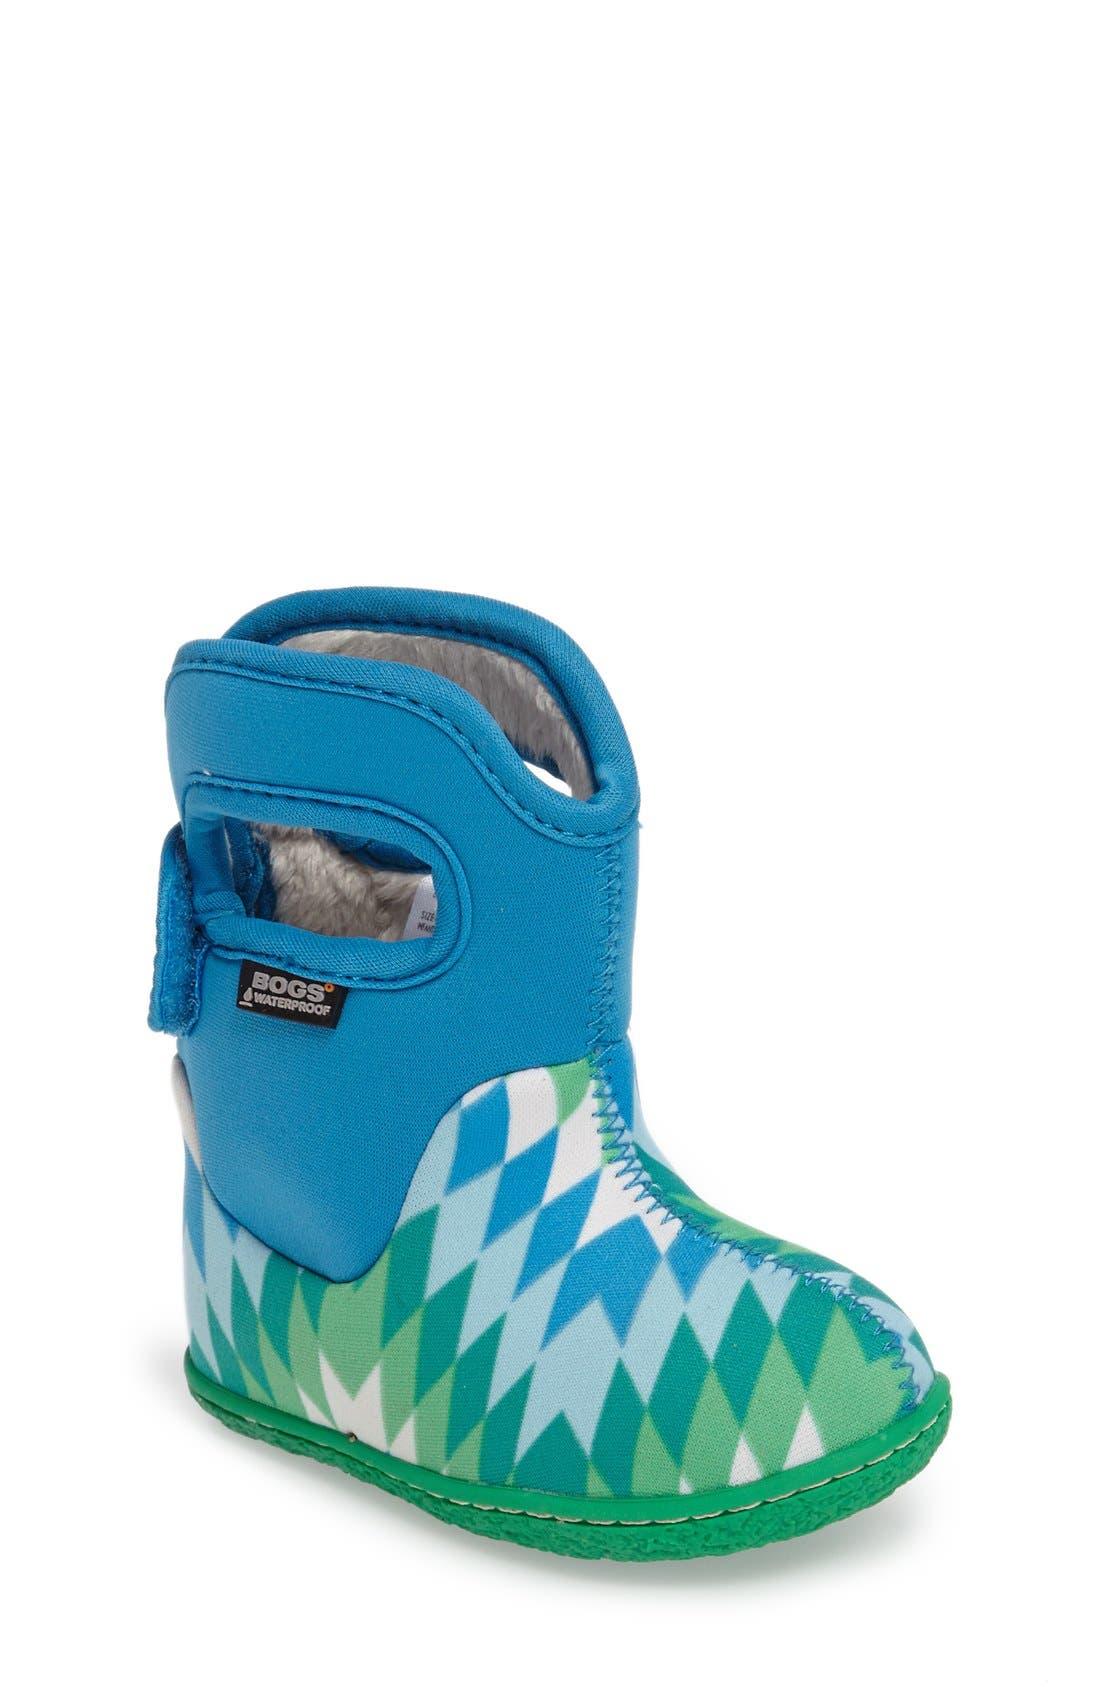 Alternate Image 1 Selected - Bogs 'Classic' Waterproof Snow Boot (Baby, Walker & Toddler)